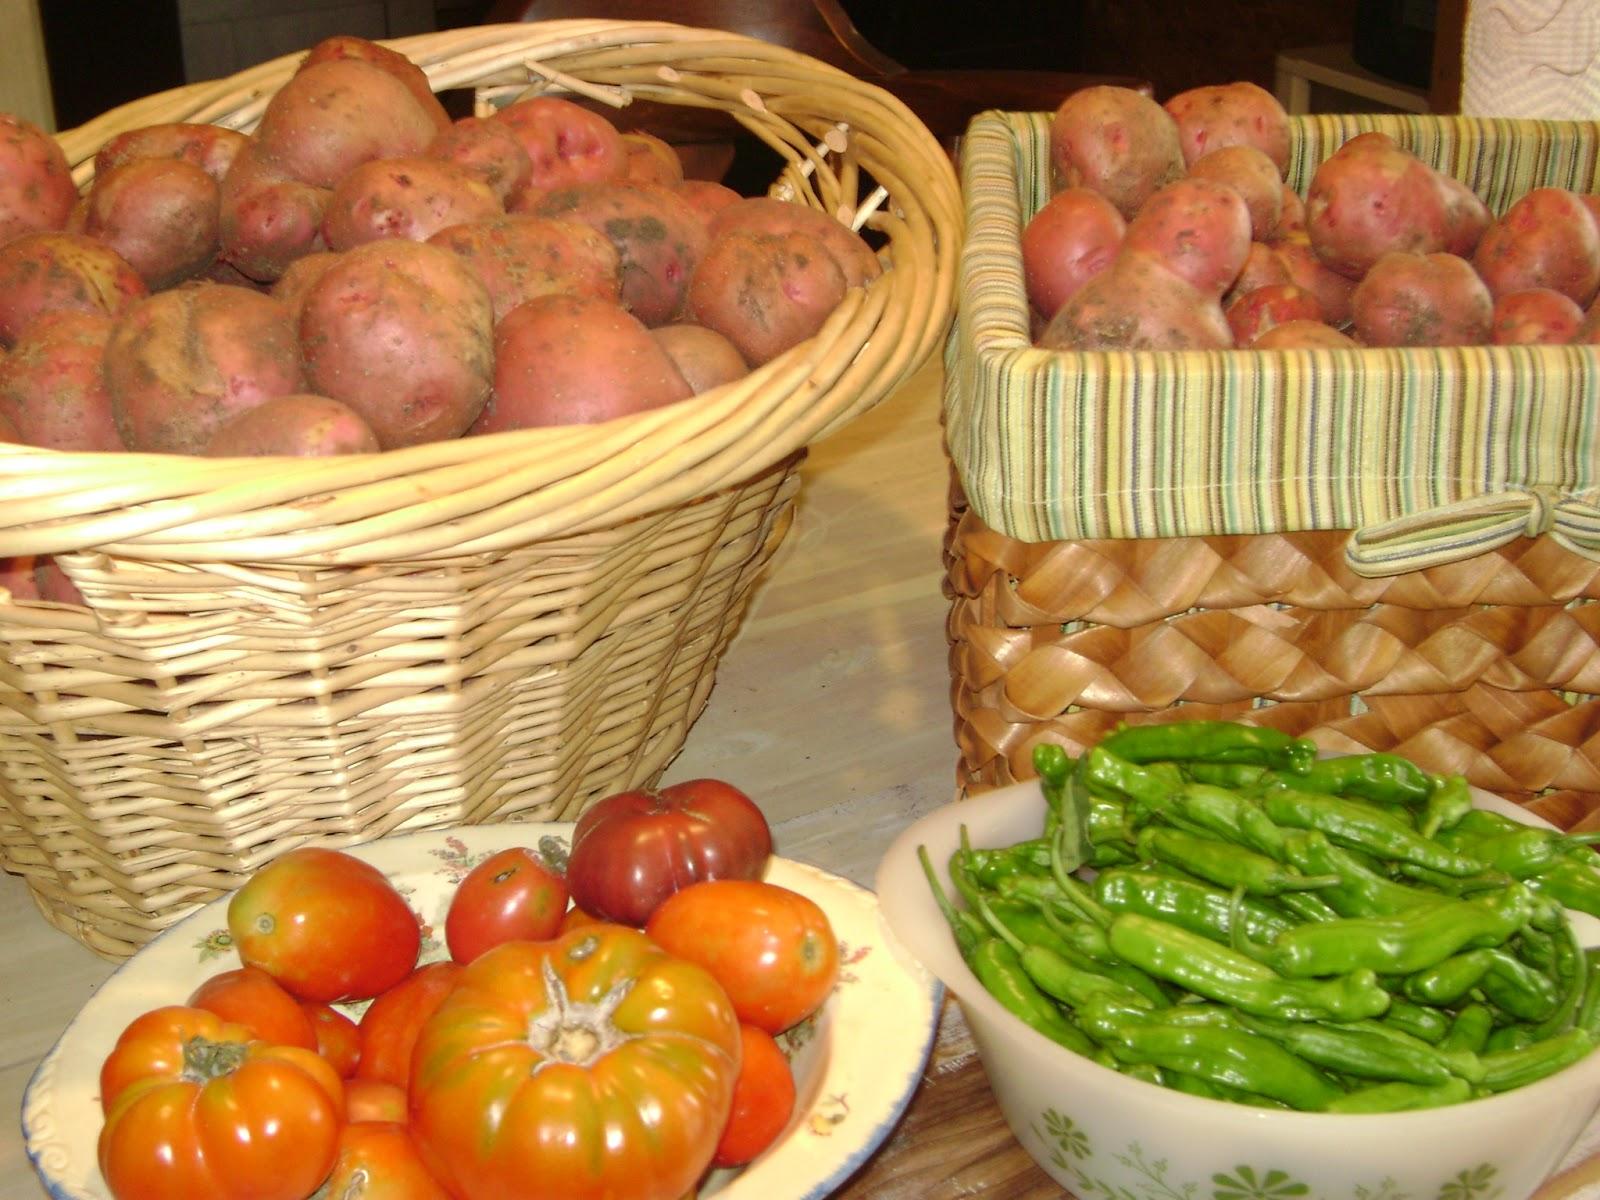 Tsg Storing And Freezing Harvested Potatoes